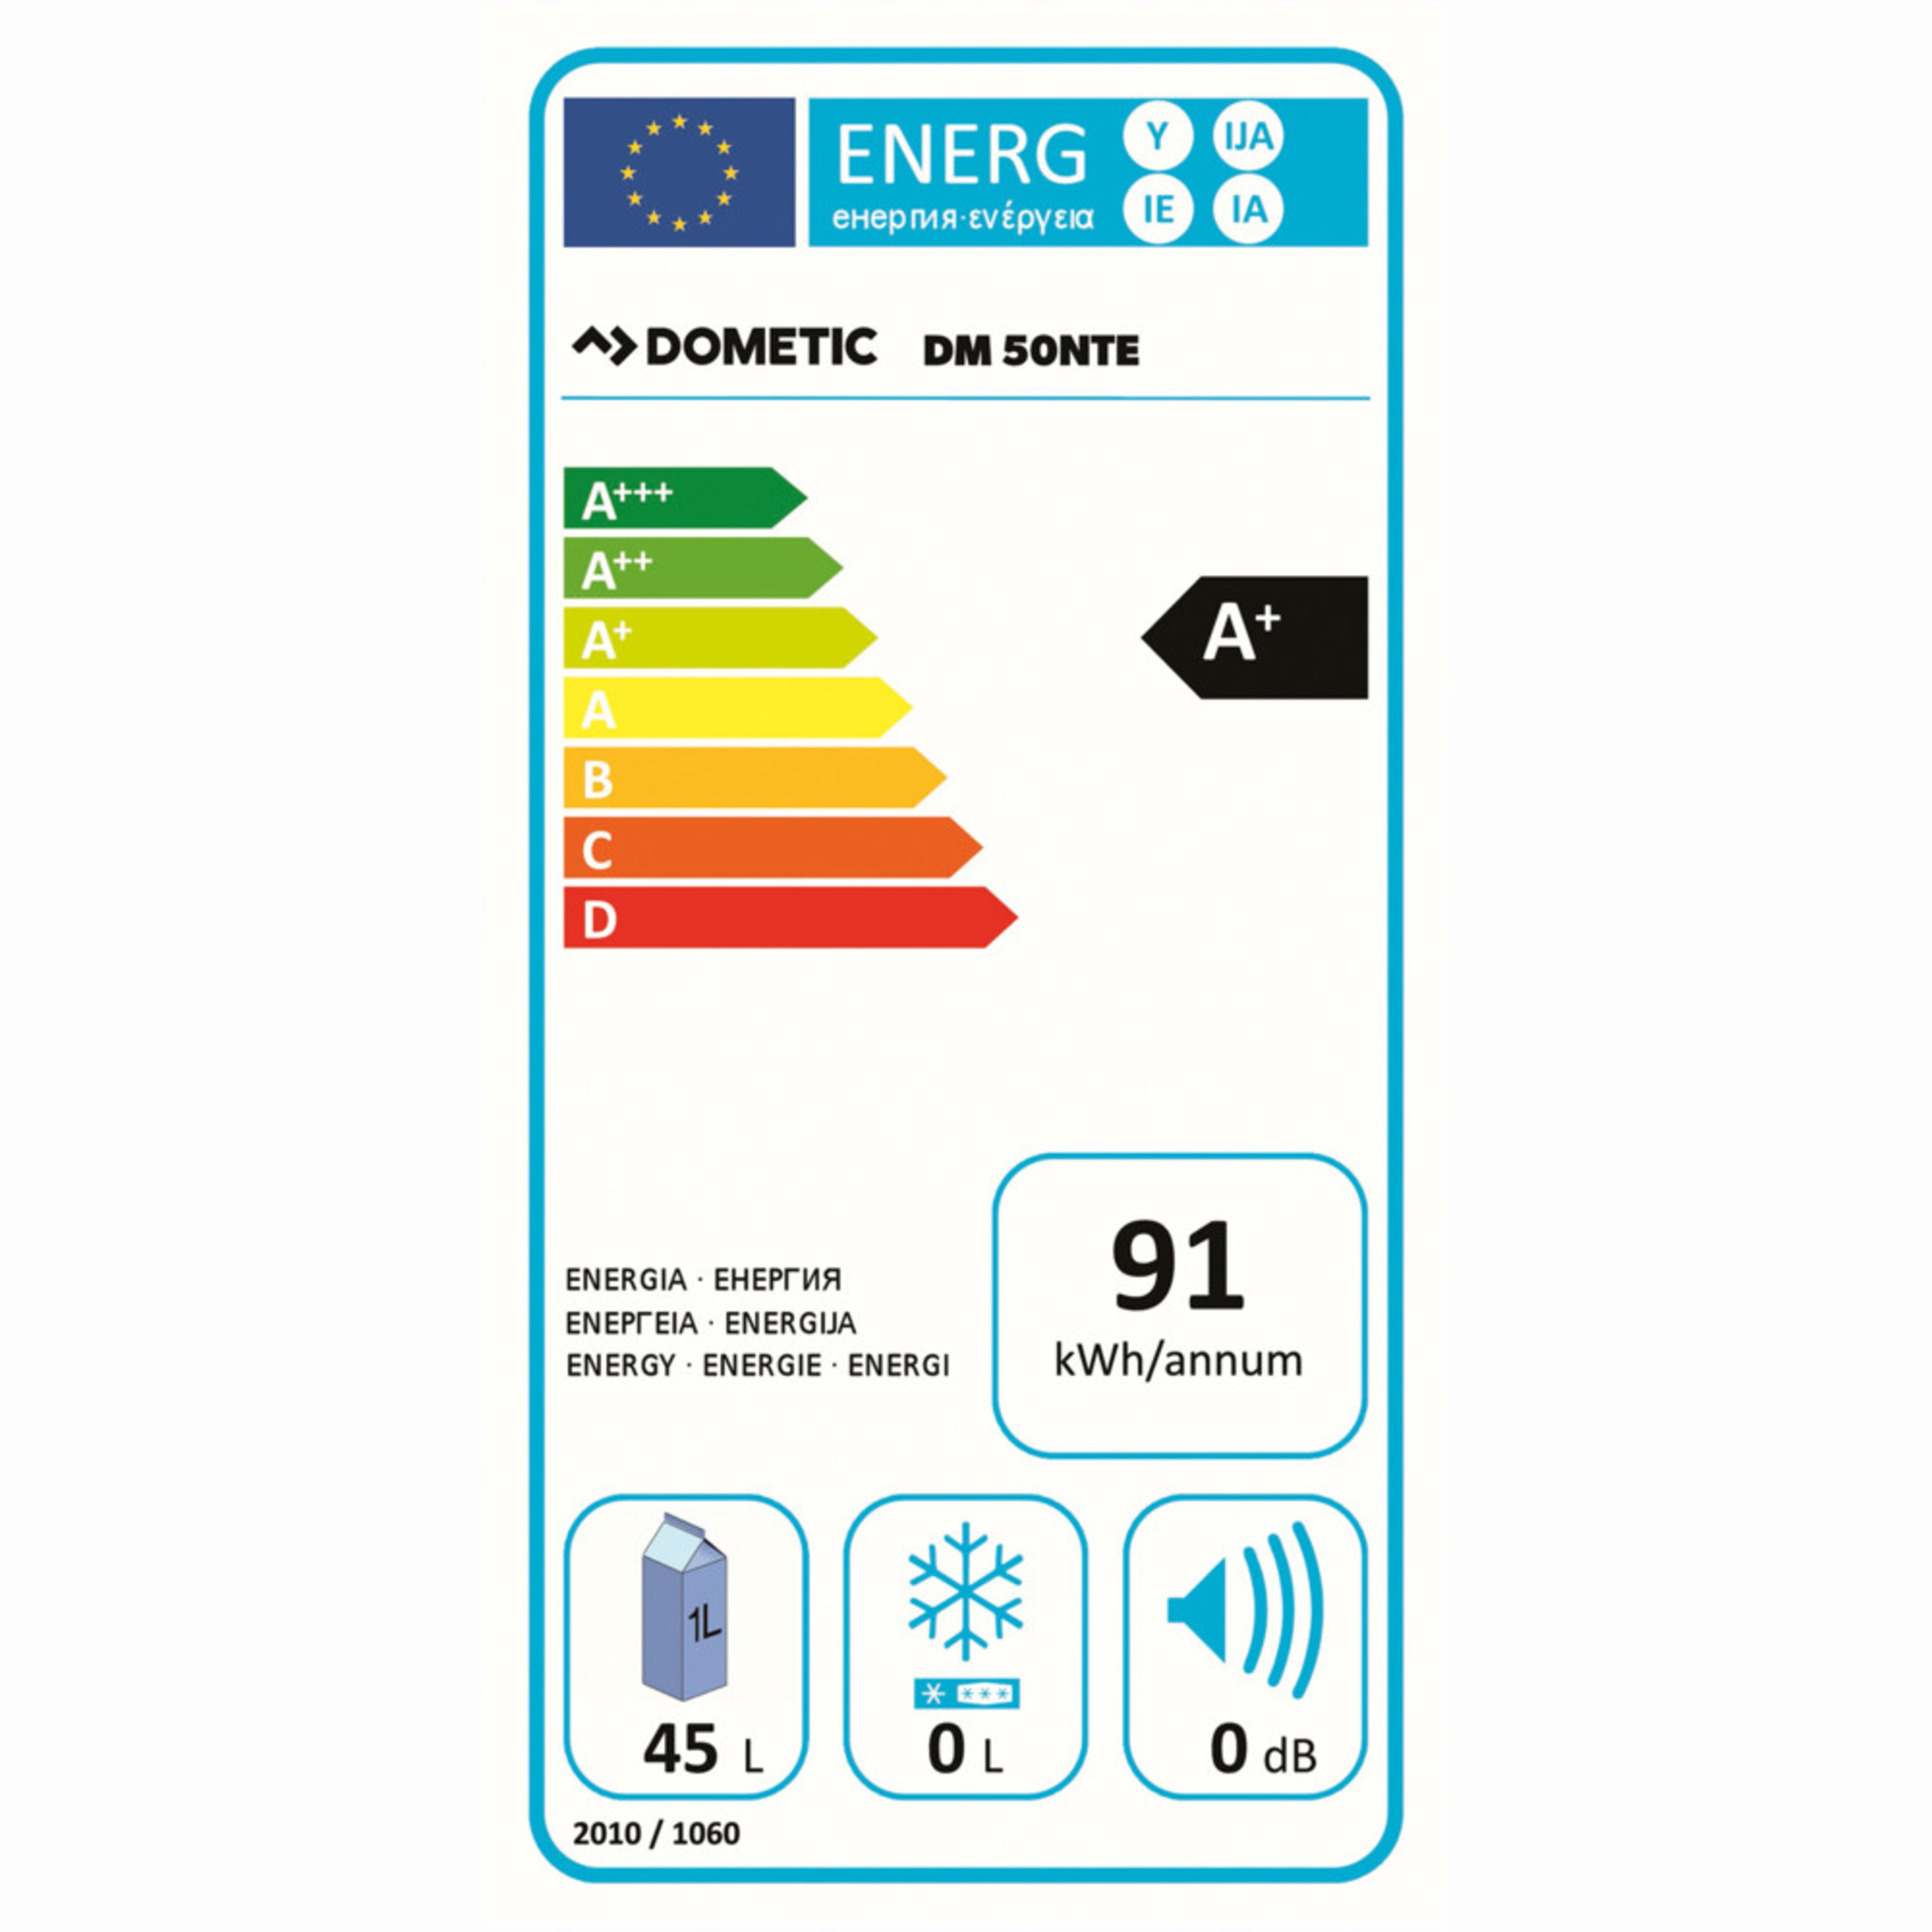 Dometic DM 50NTE D Energy label